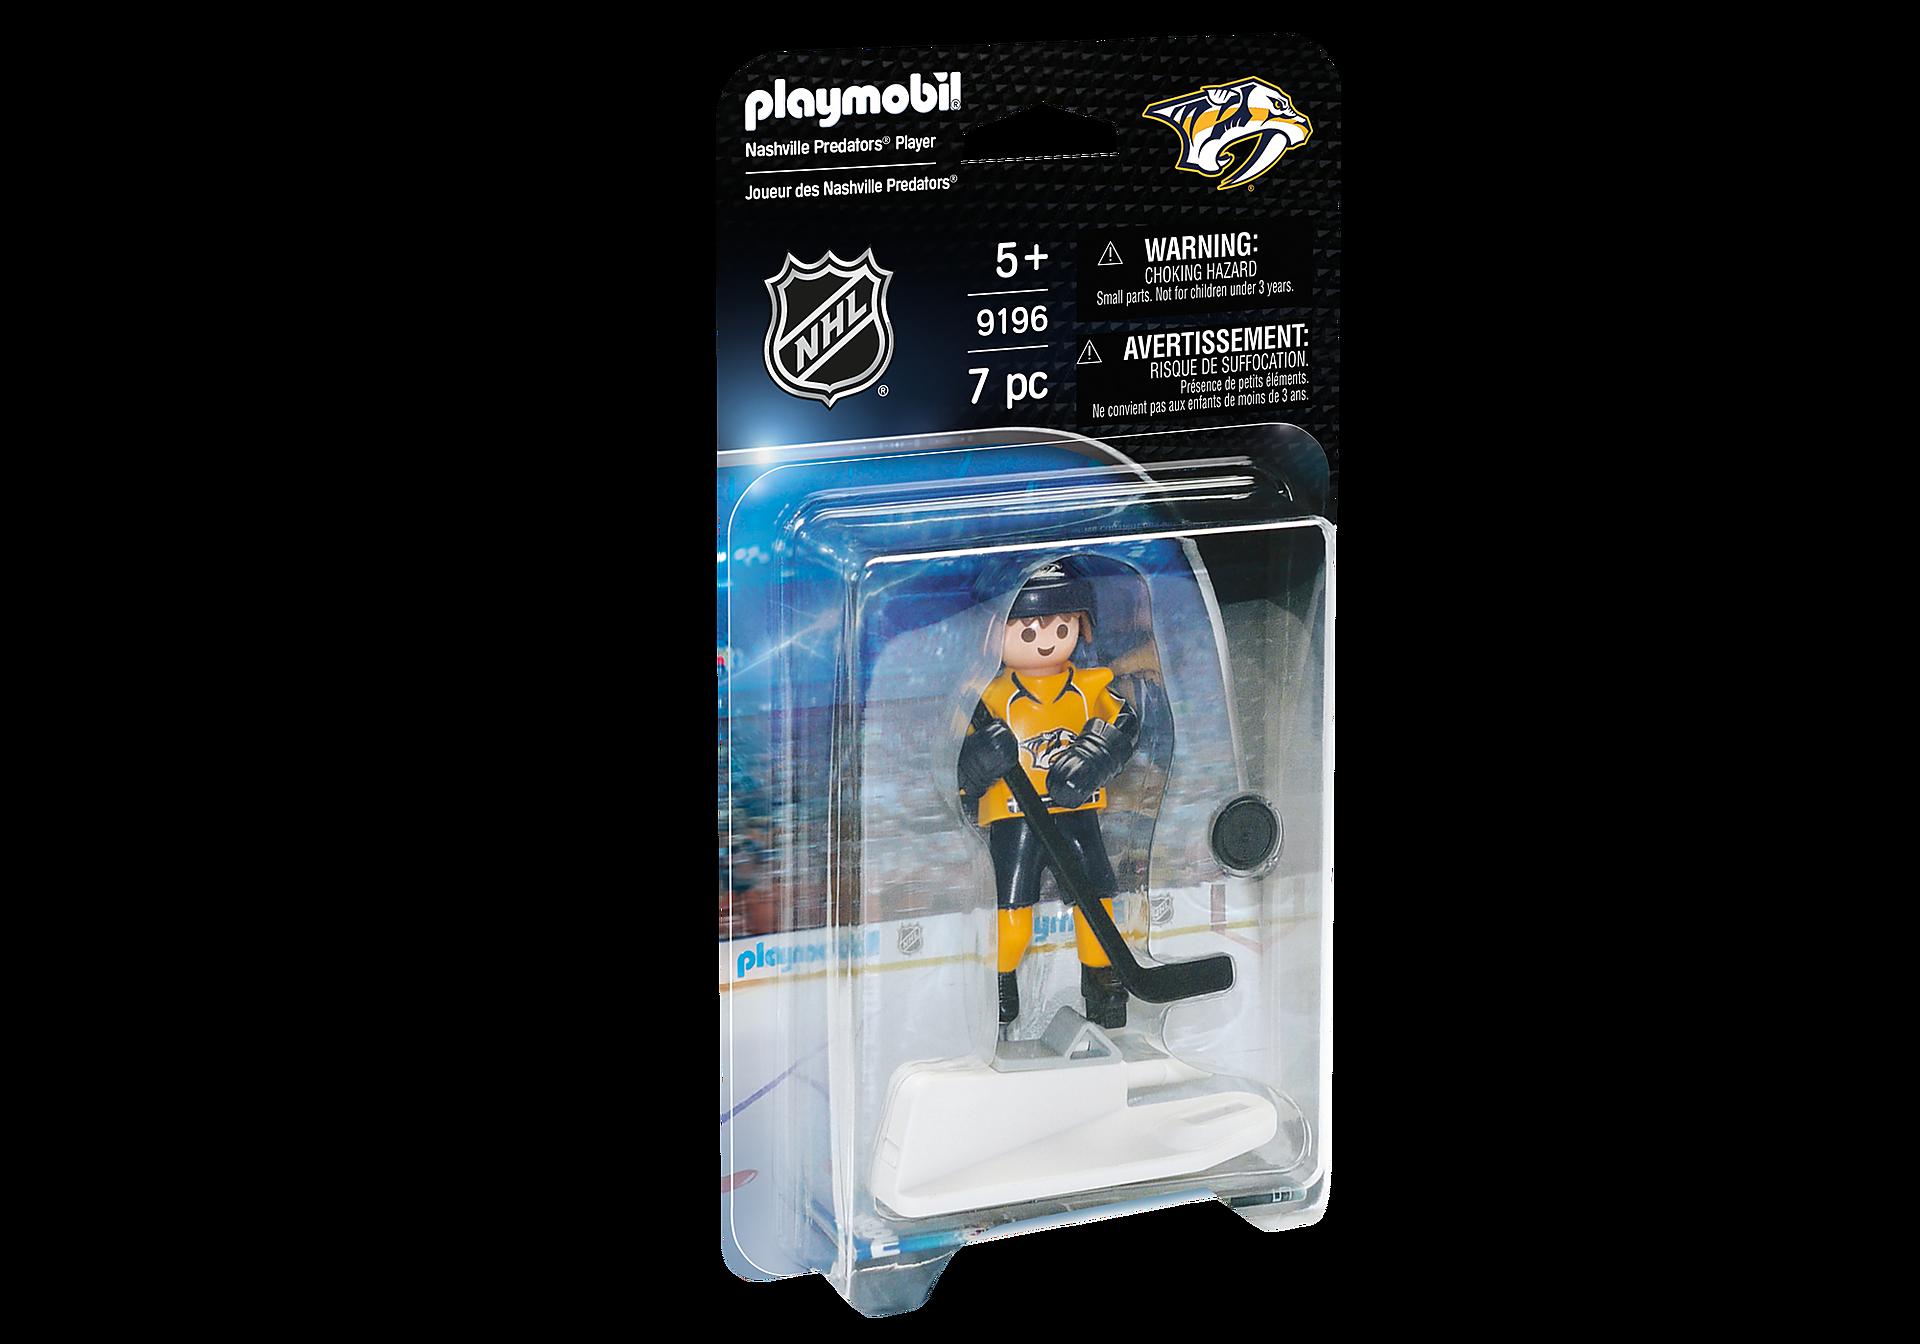 9196 NHL™ Nashville Predators™ Player zoom image2